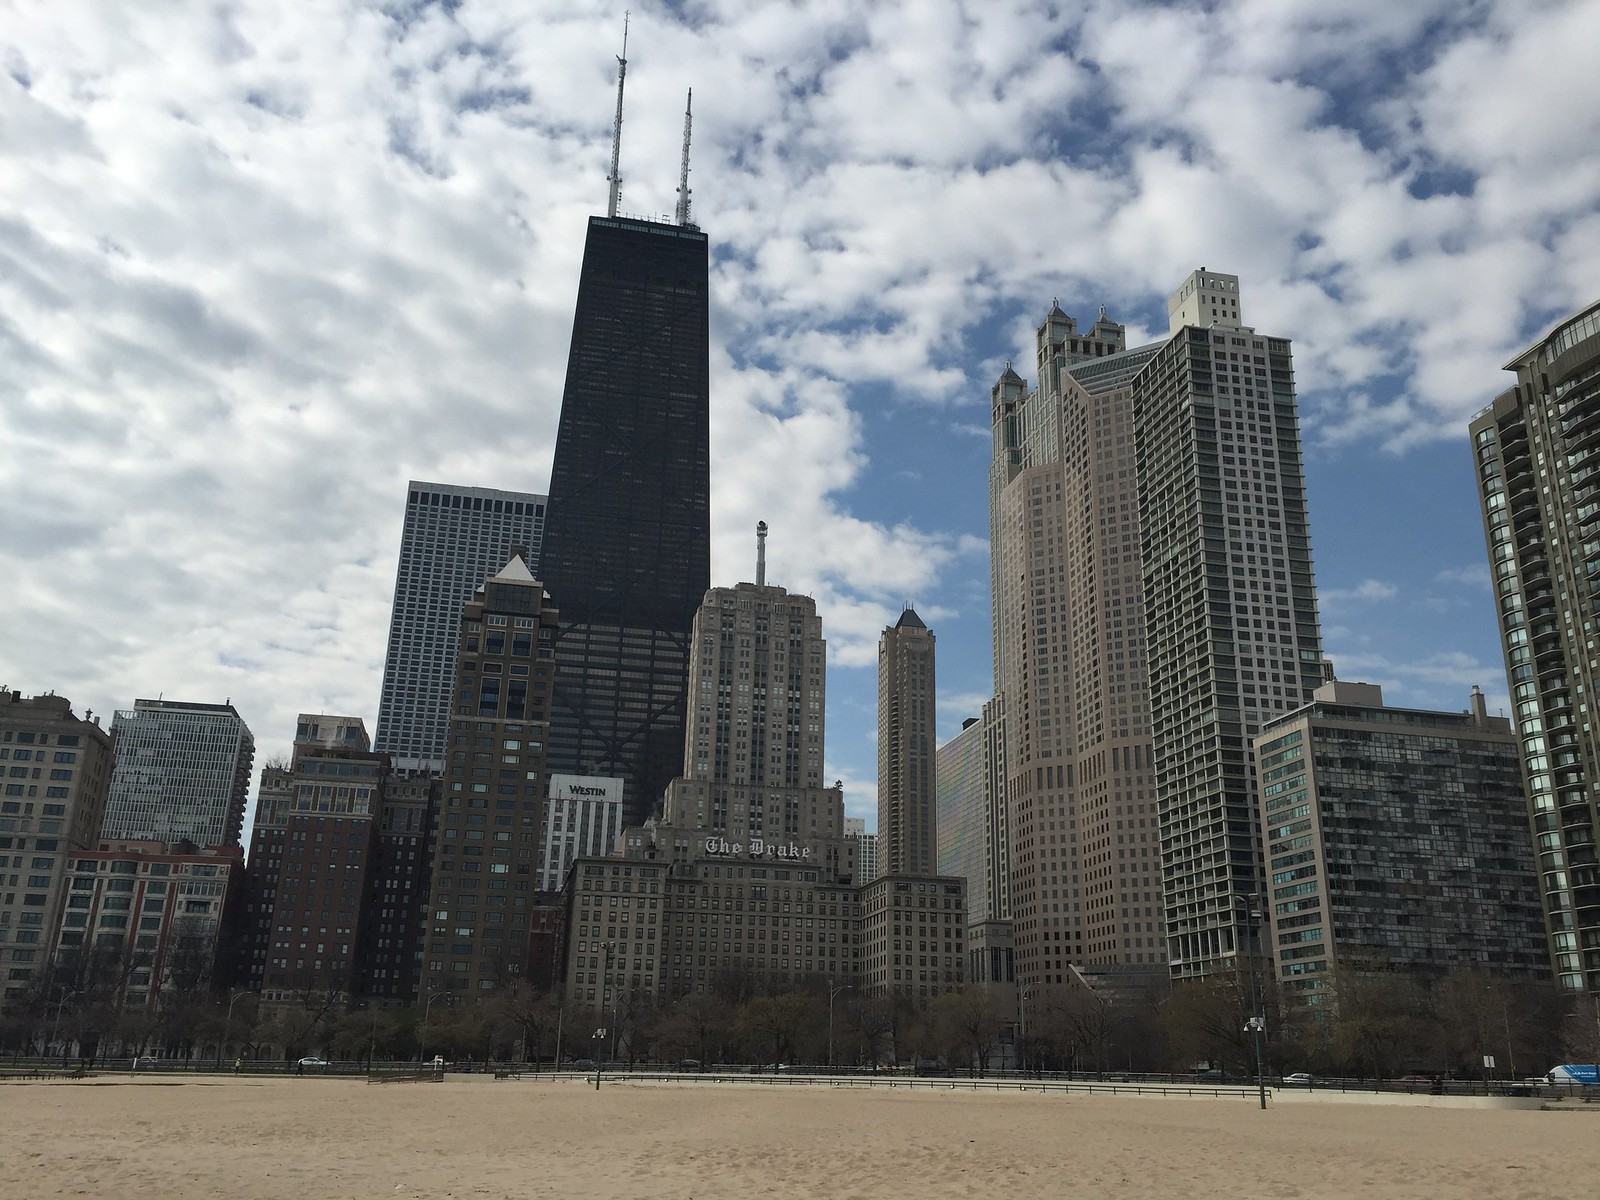 Chicago 24-04-2015 09-25-27